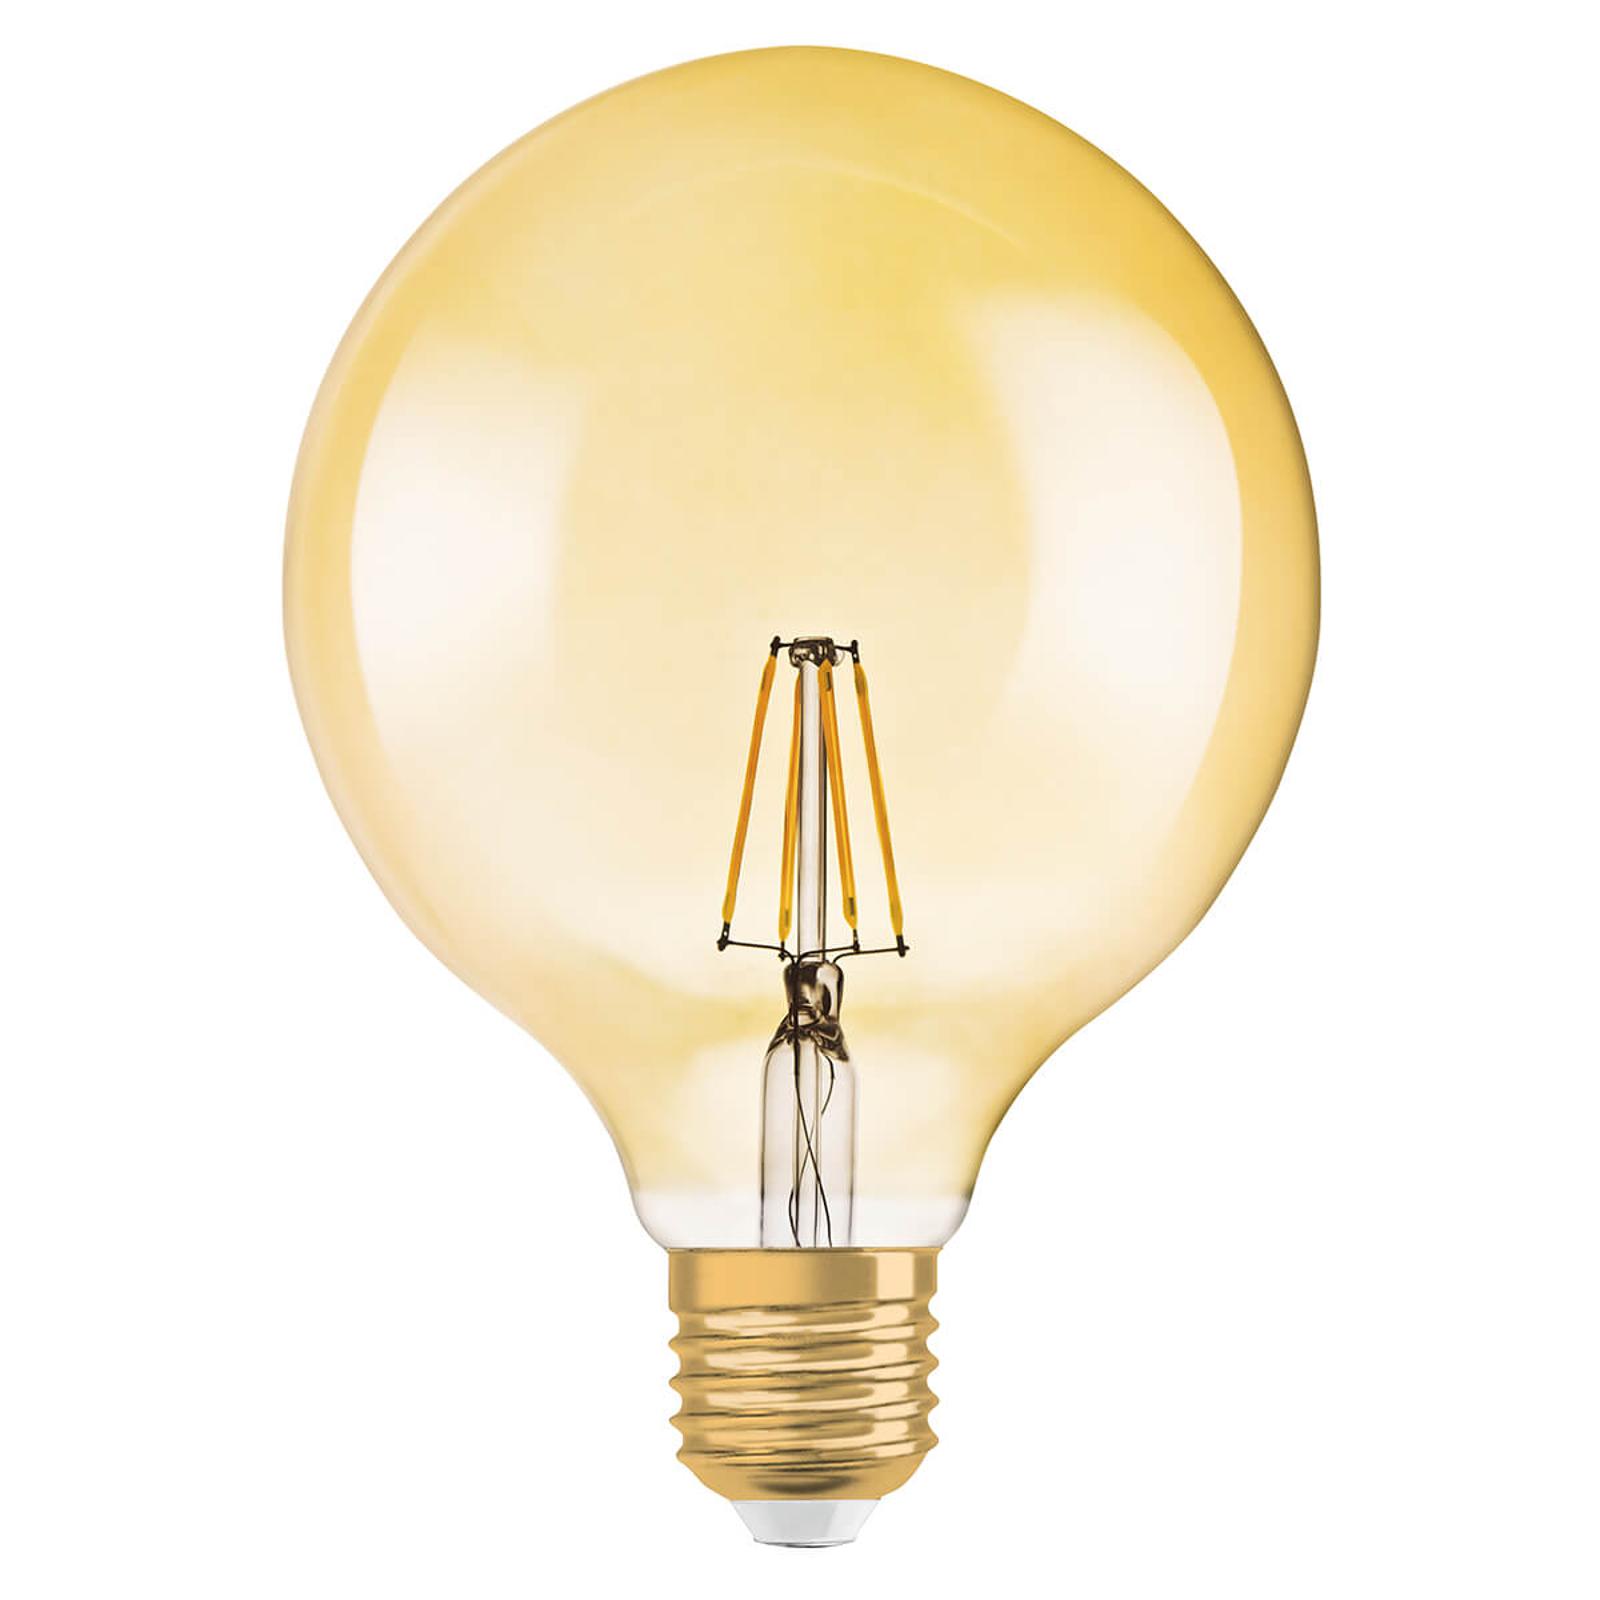 LED-Globelampe Gold E27 2,5W, warmweiß, 225 Lumen